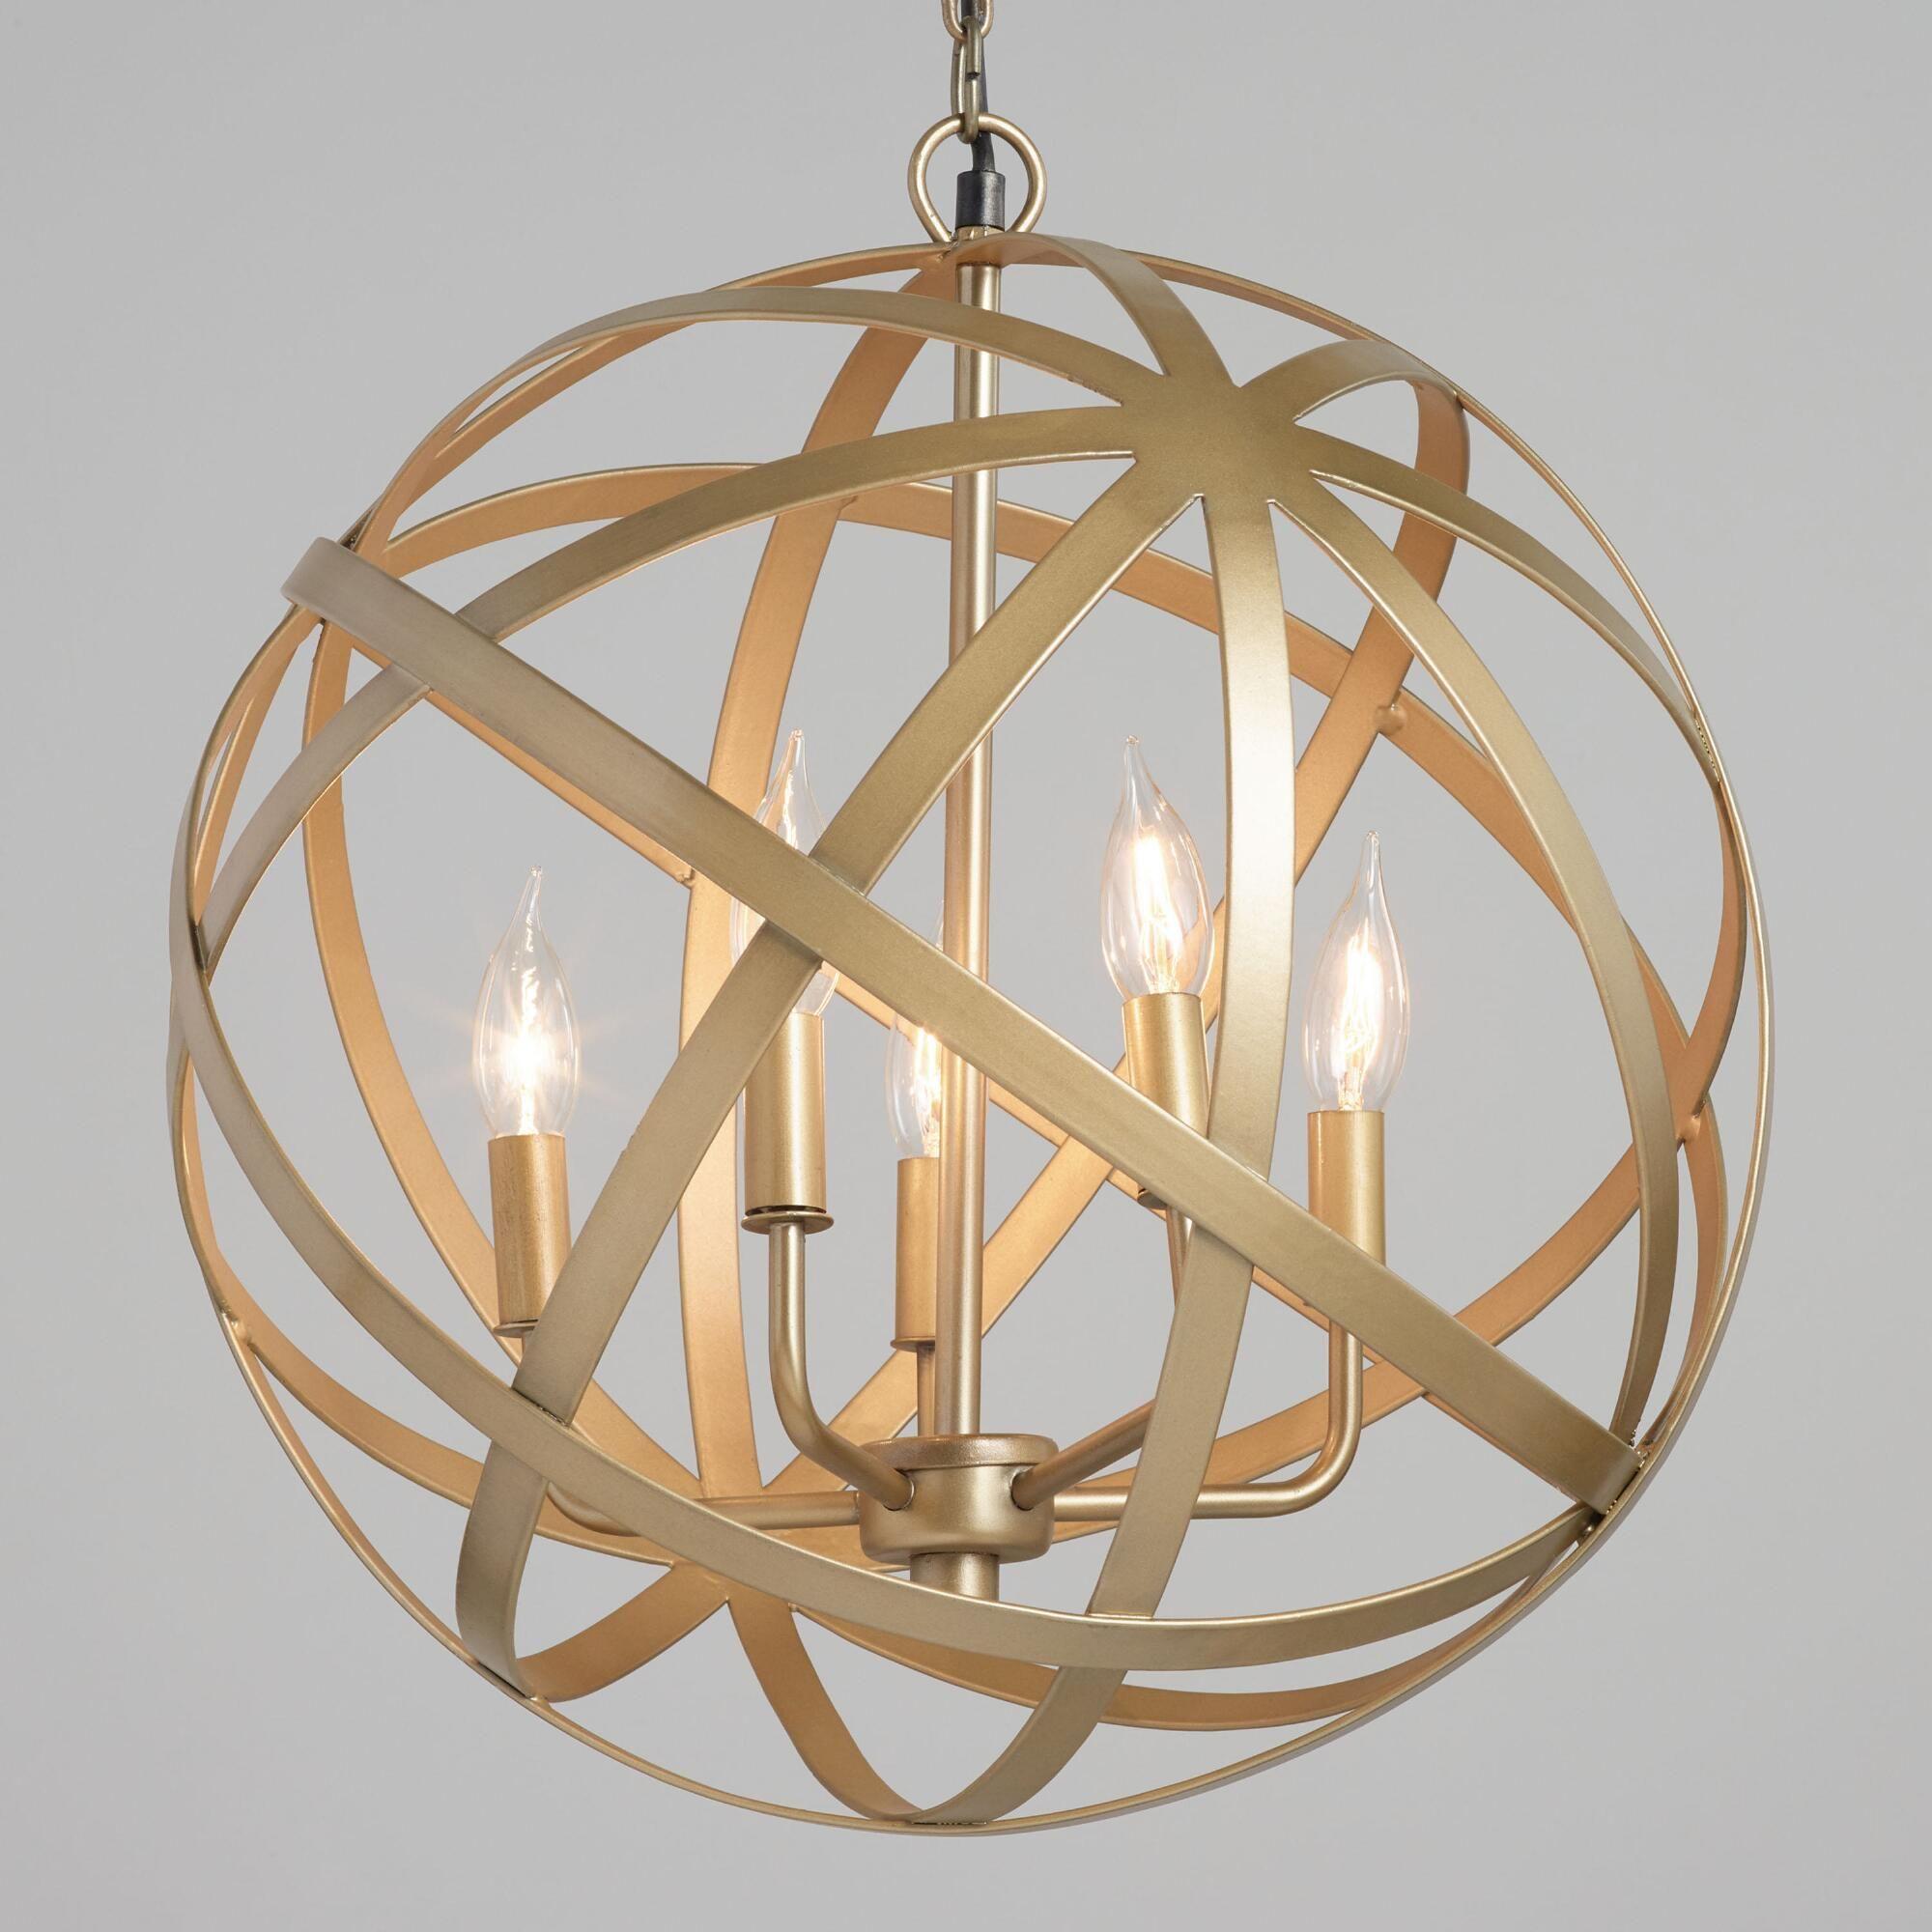 Fabulous Antique Brass Orb 5 Light Chandelier By World Market Interior Design Ideas Tzicisoteloinfo